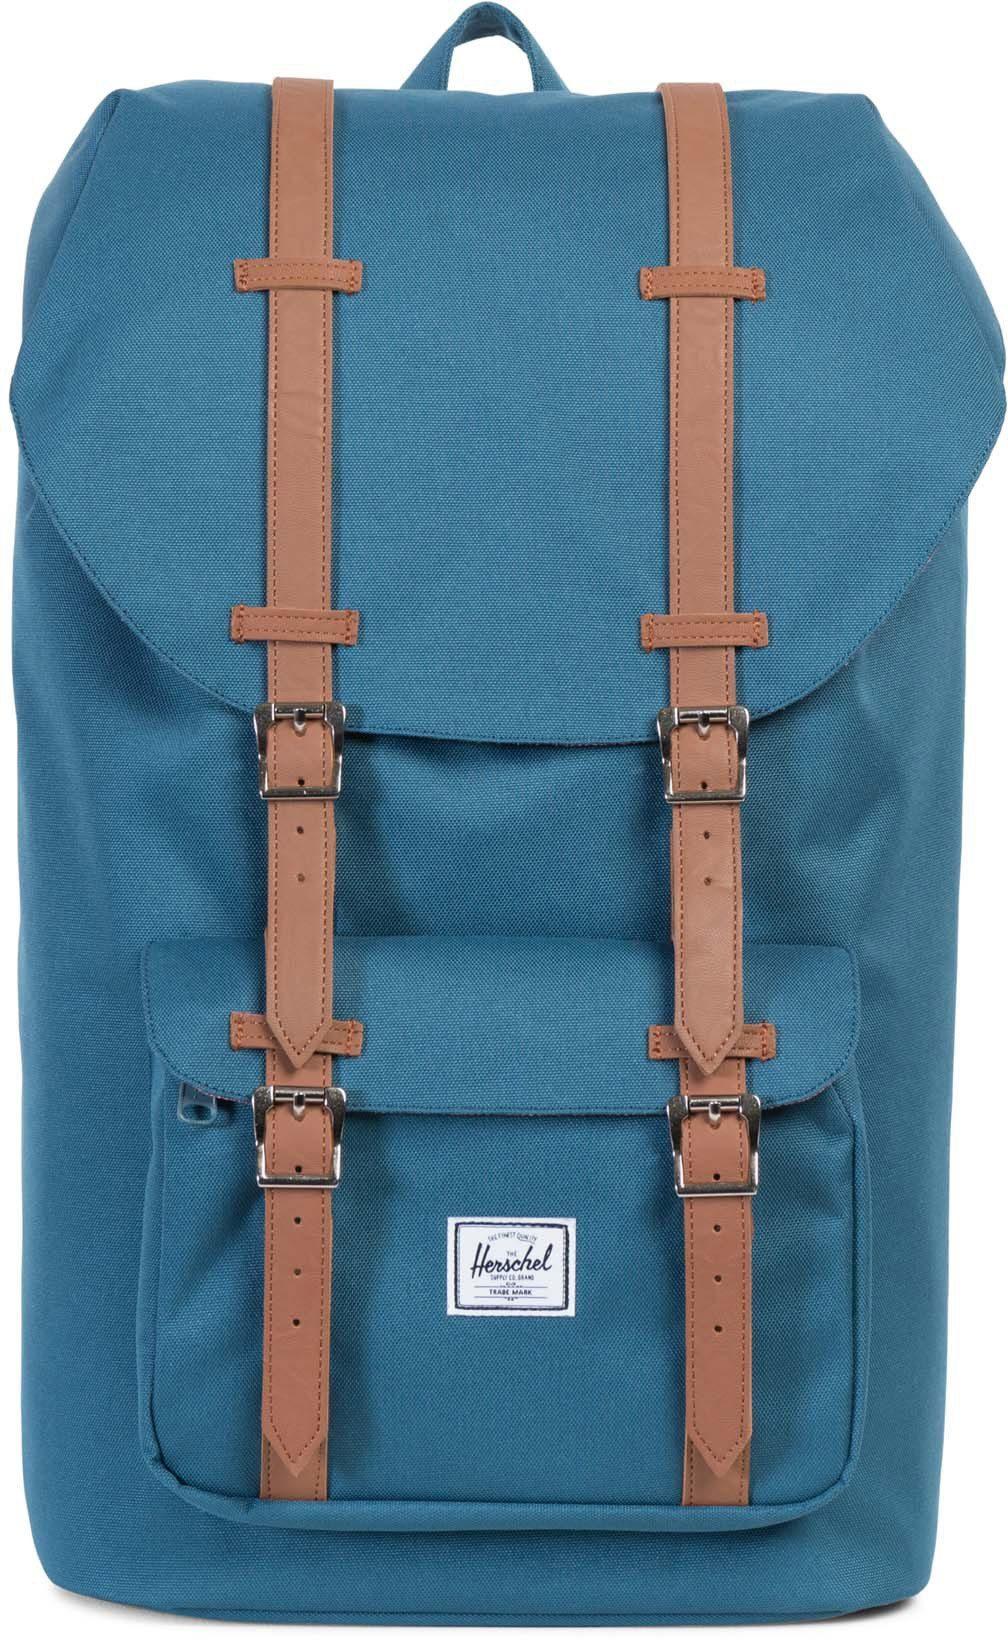 Herschel Rucksack mit Laptopfach, »Little America Backpack, Indian Teal«